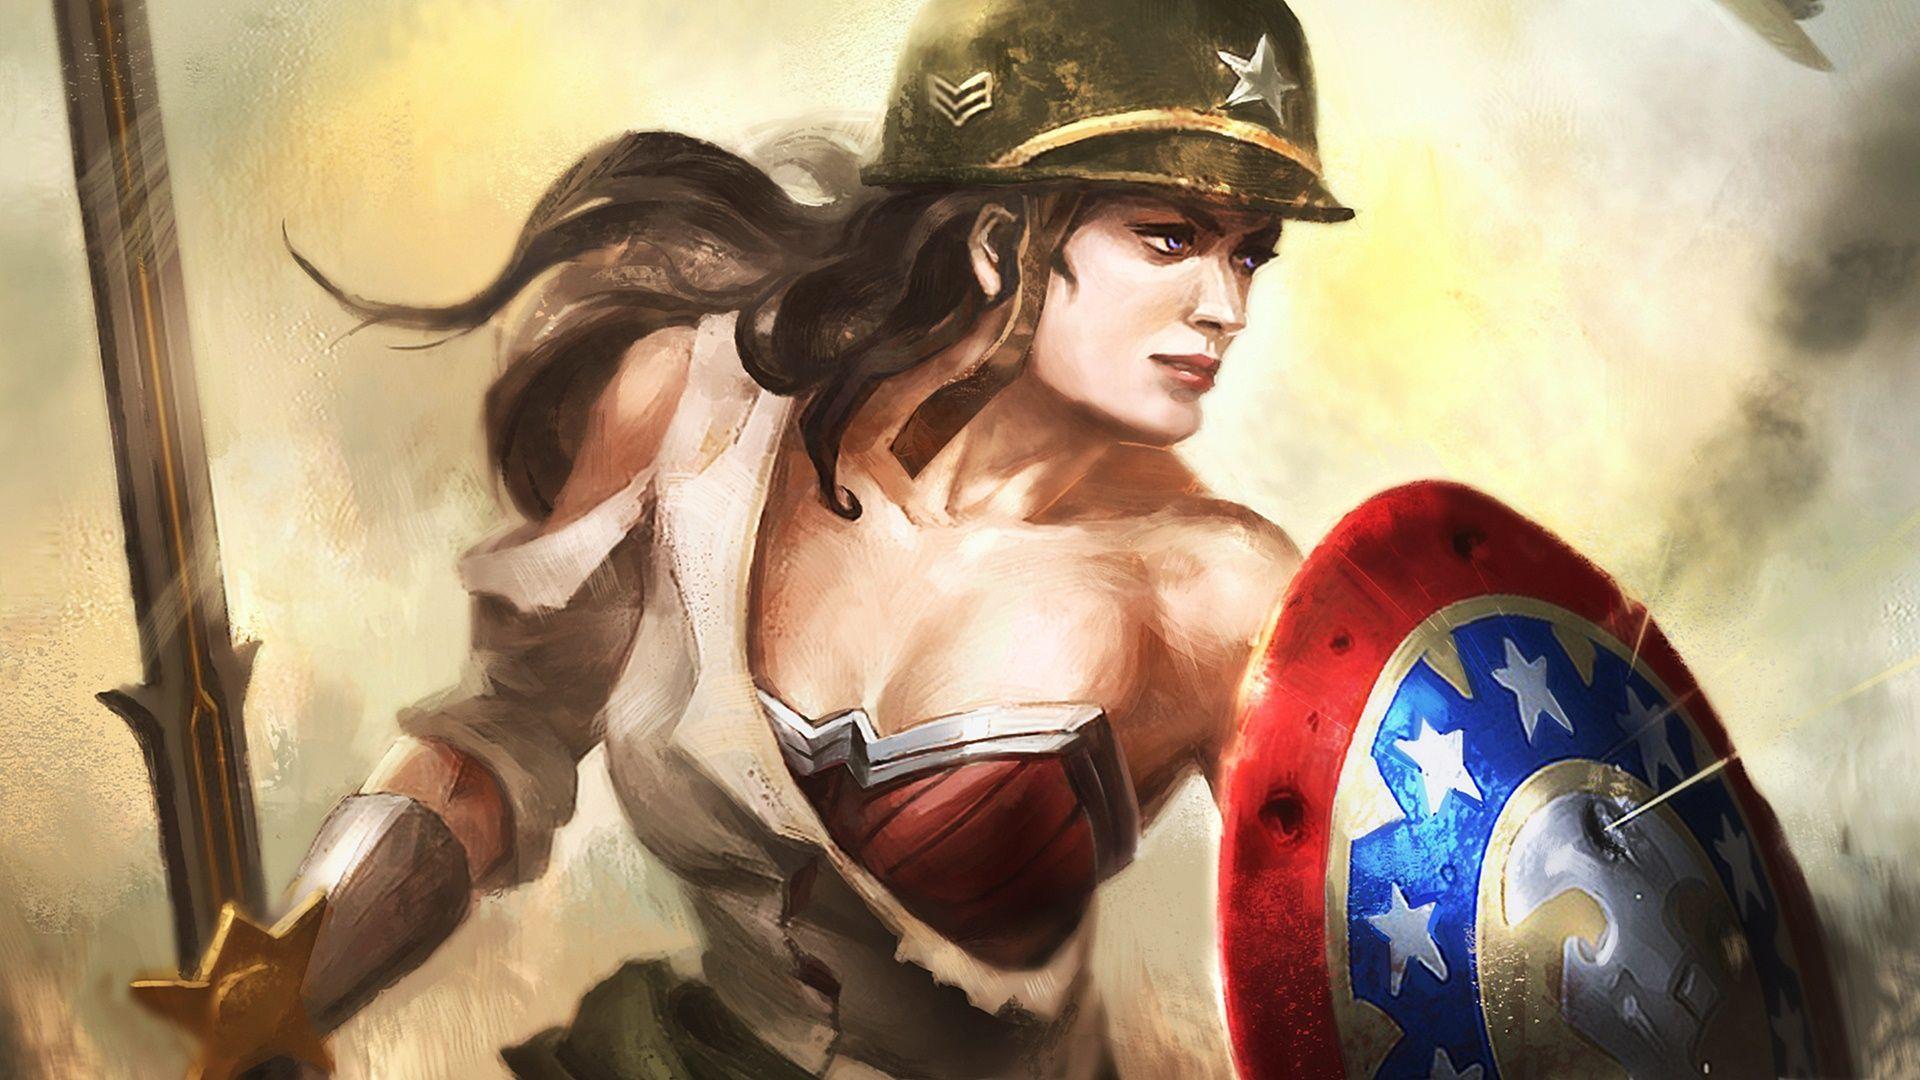 Wonder Woman wallpaper – wallpaper free download